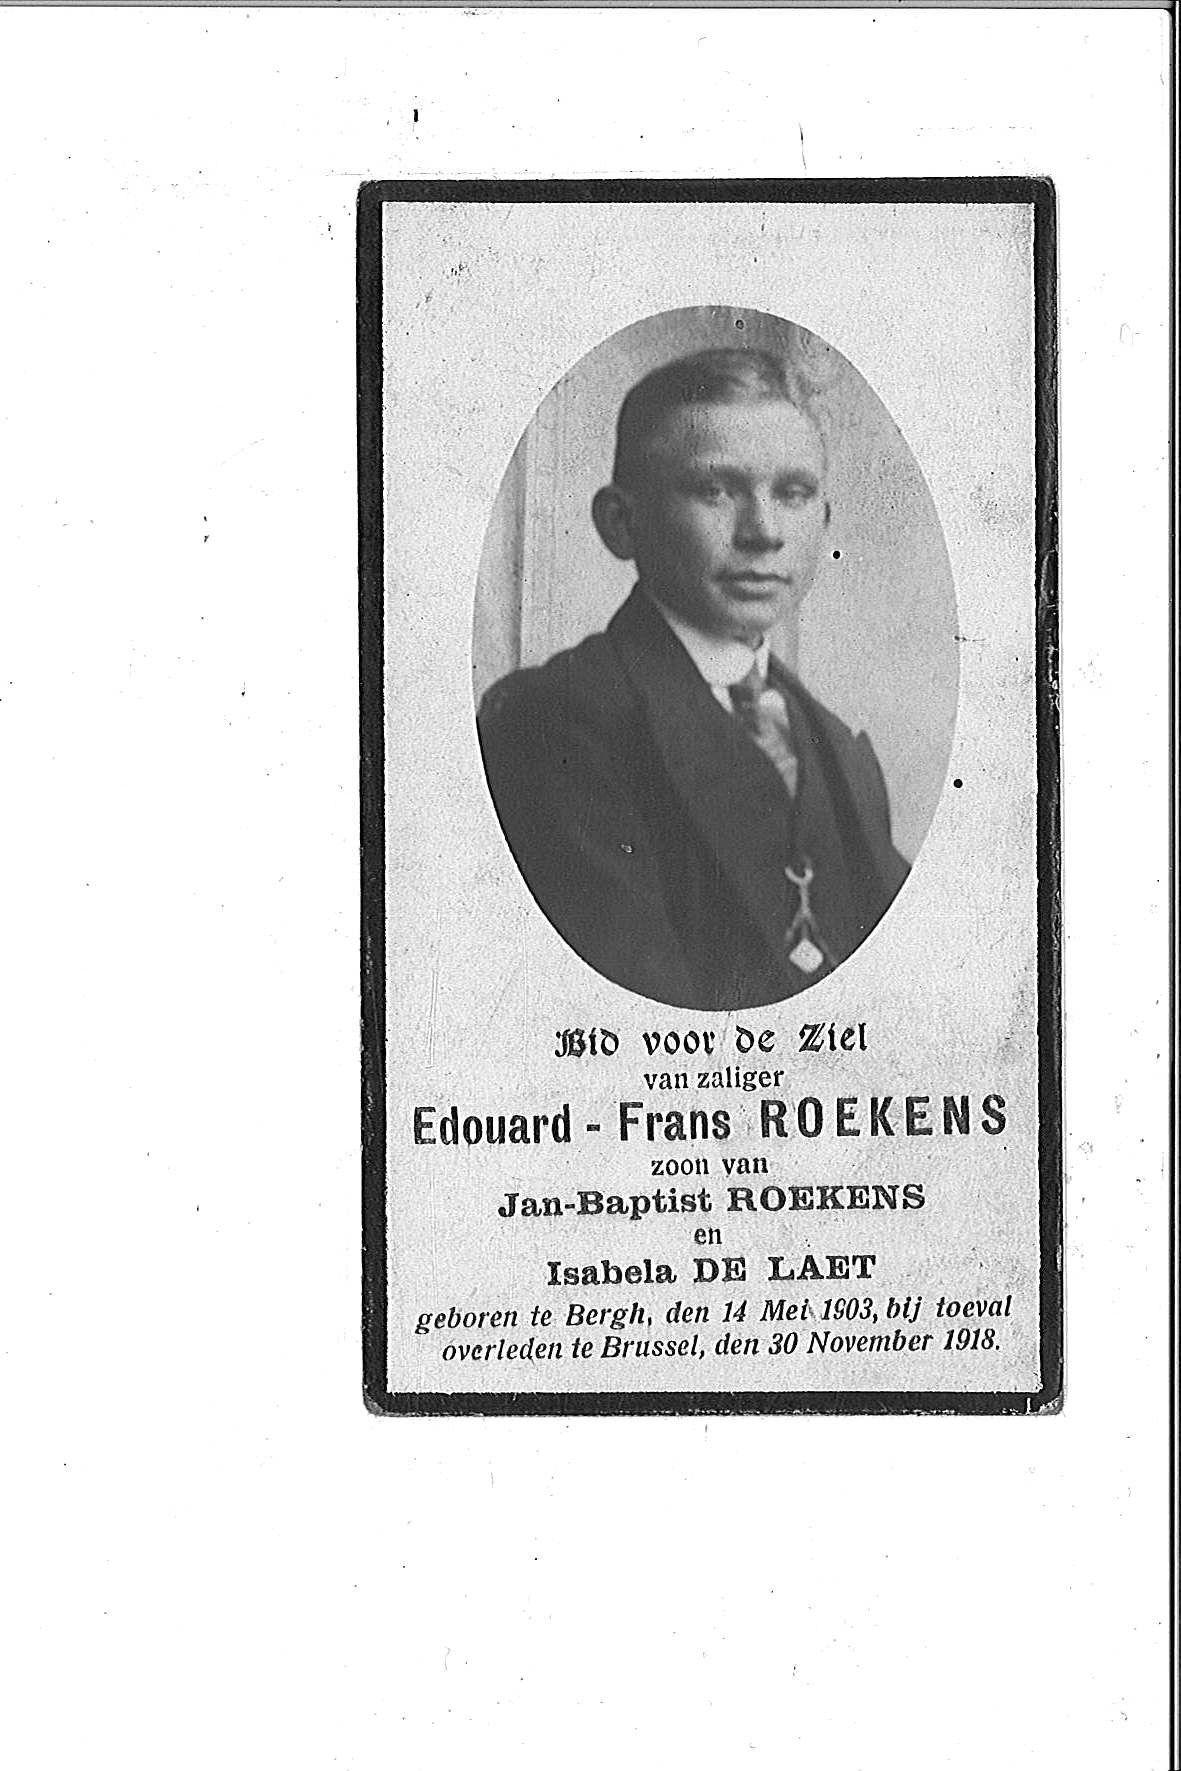 Edouard-Frans(1918)20141127153232_00118.jpg